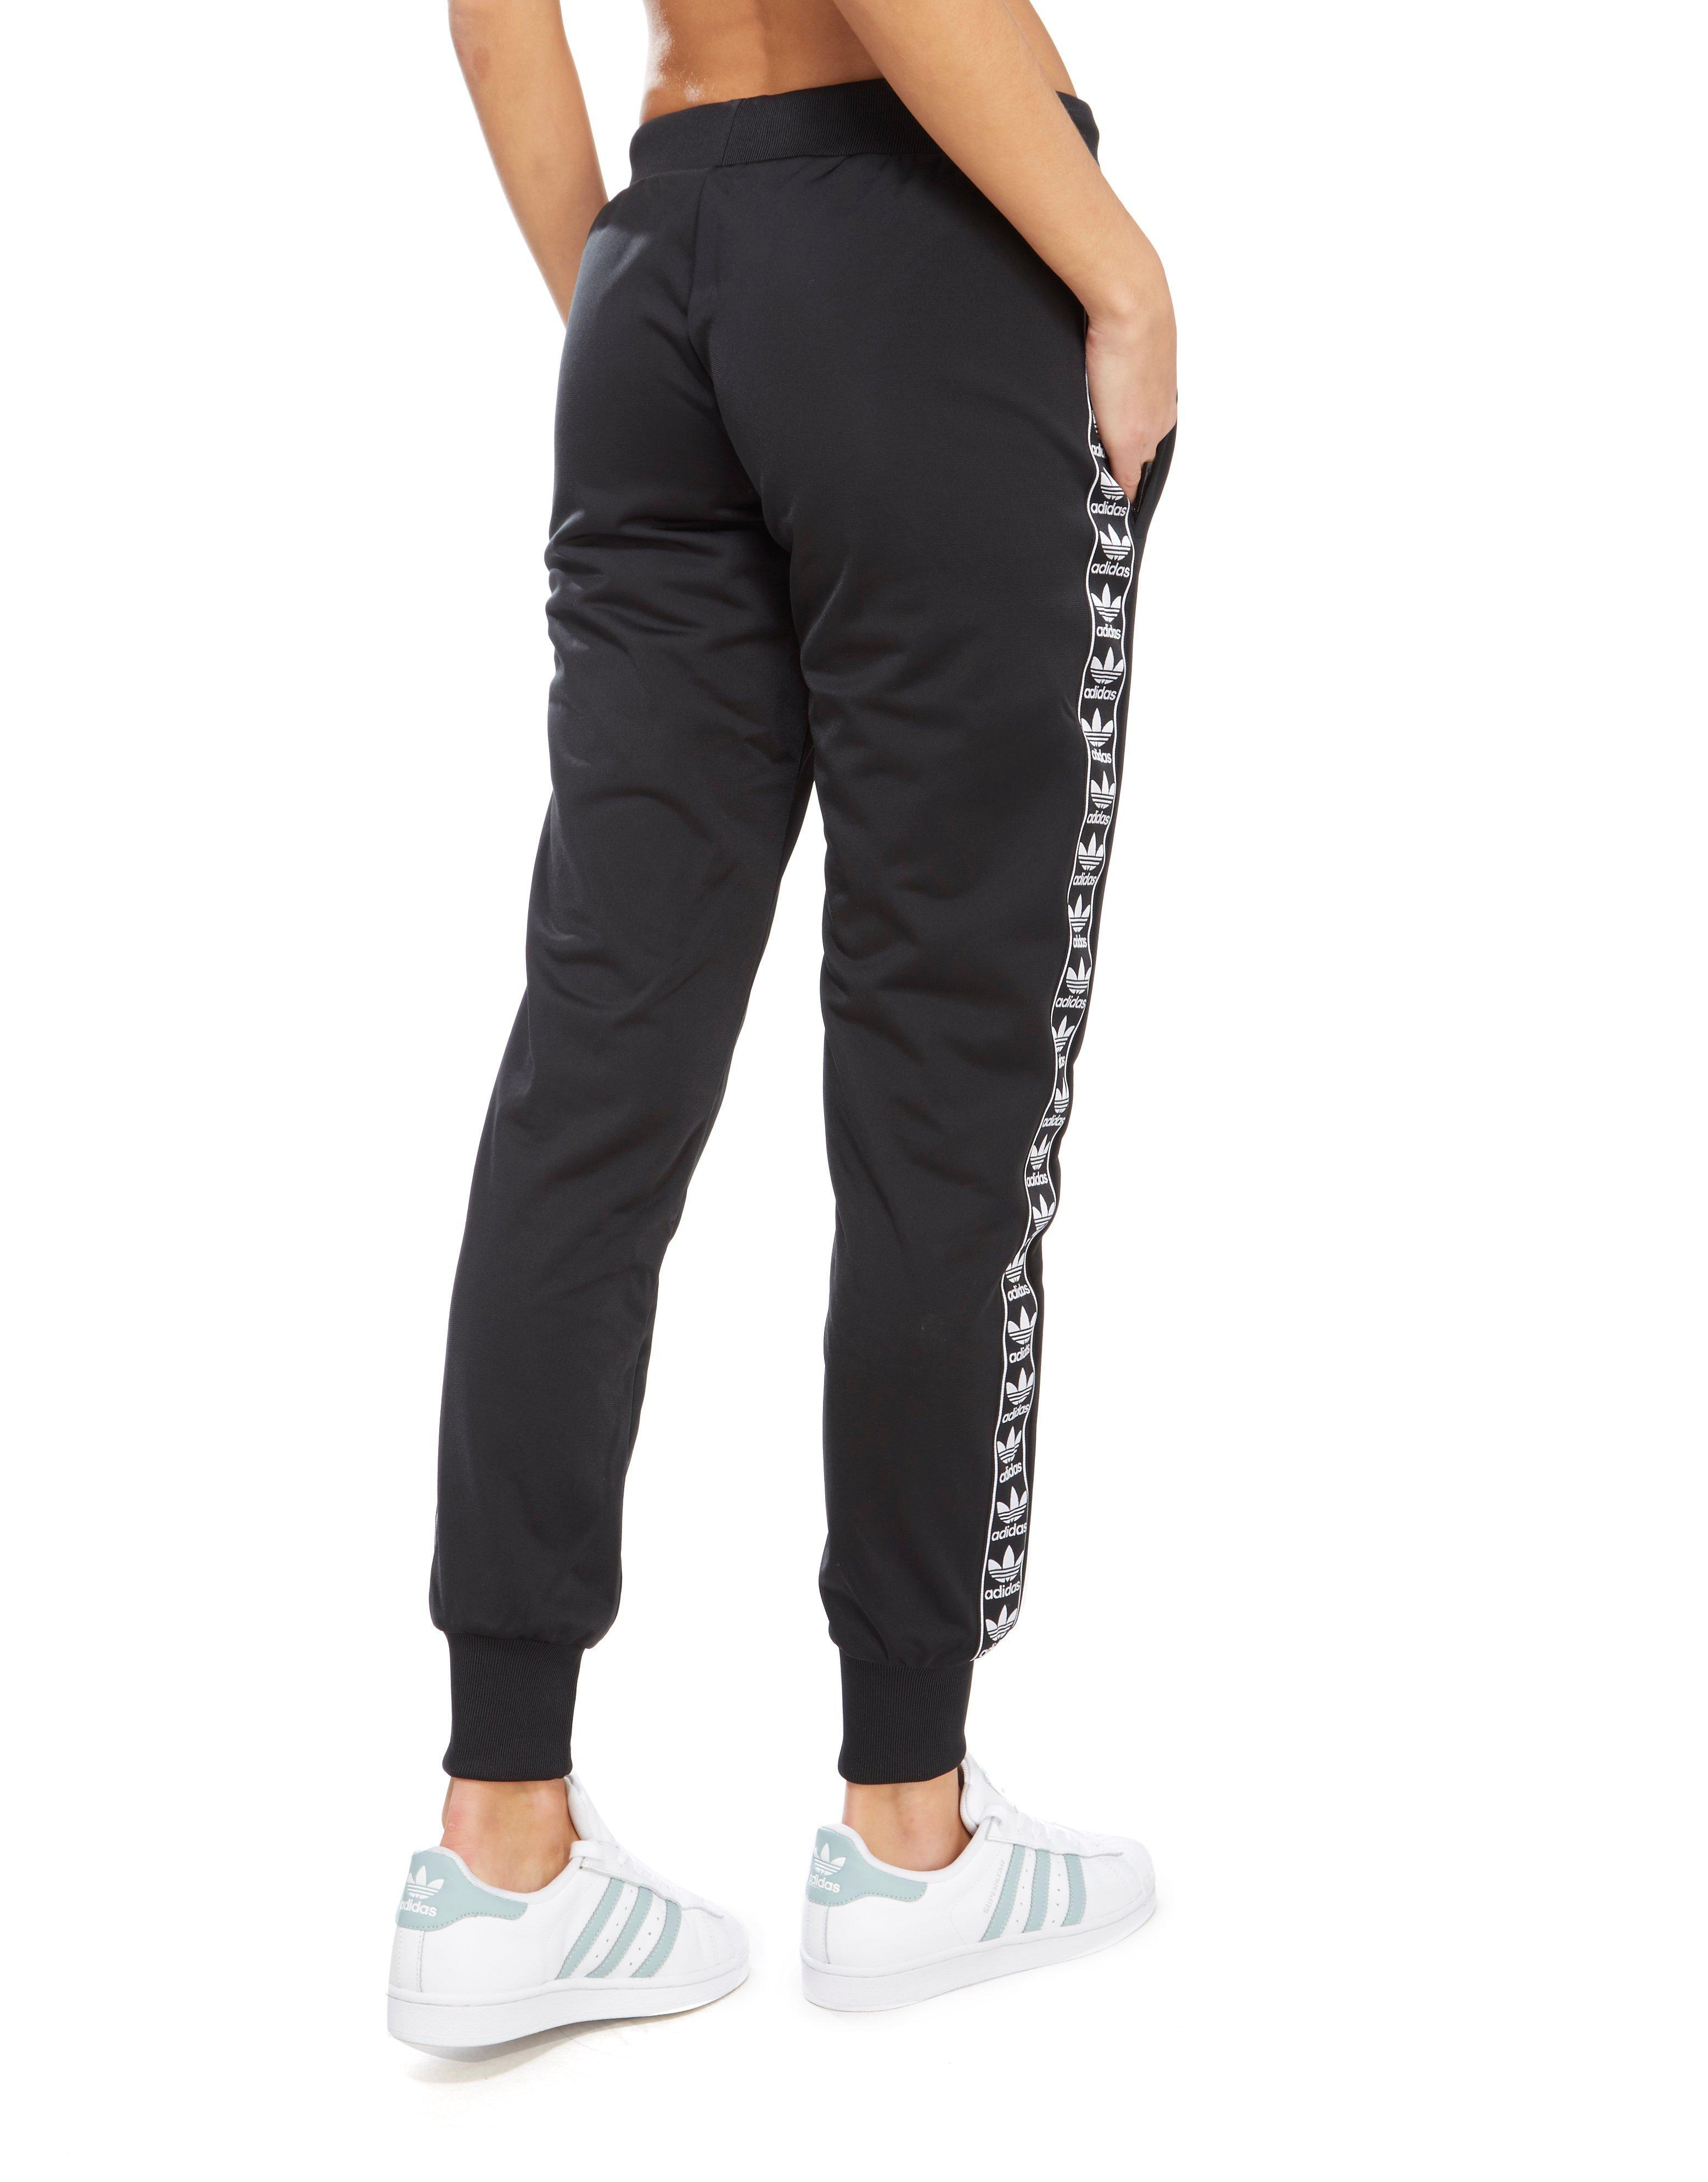 2bf4a09f16d5 Lyst - adidas Originals Firebird Tape Track Pants in Black